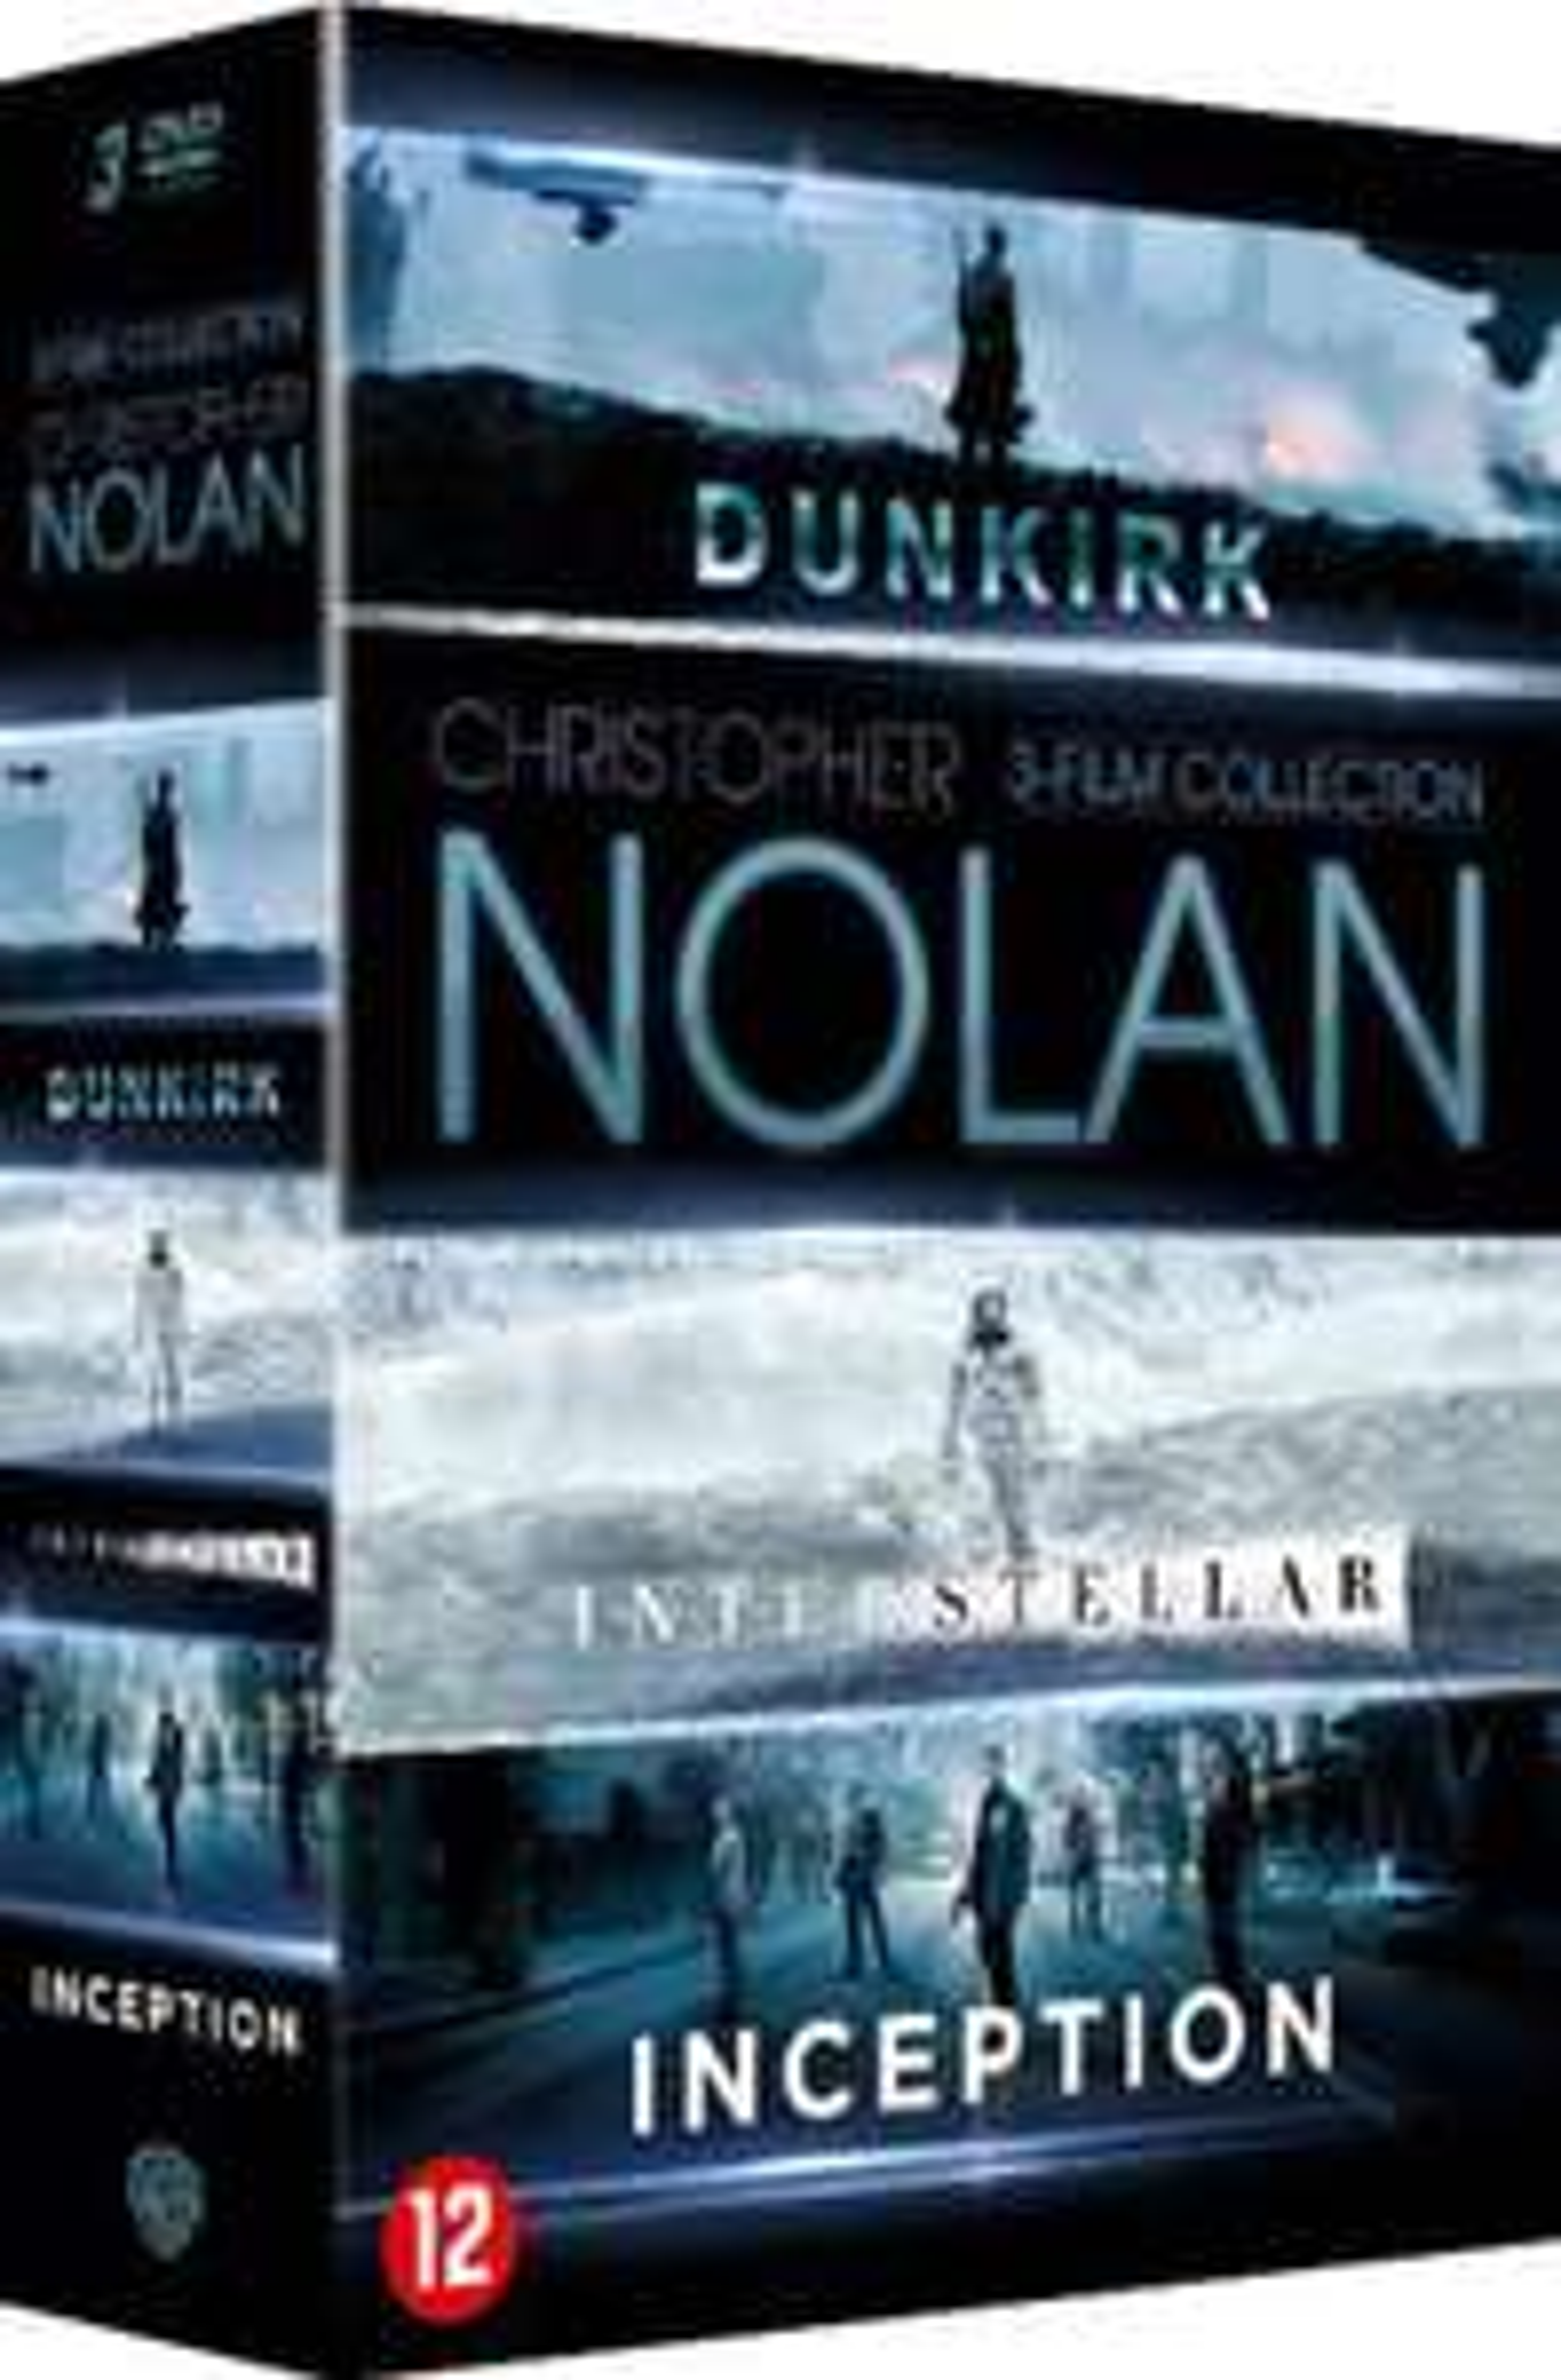 Christopher Nolan Boxset (Dunkirk, Interstellar & Inception)